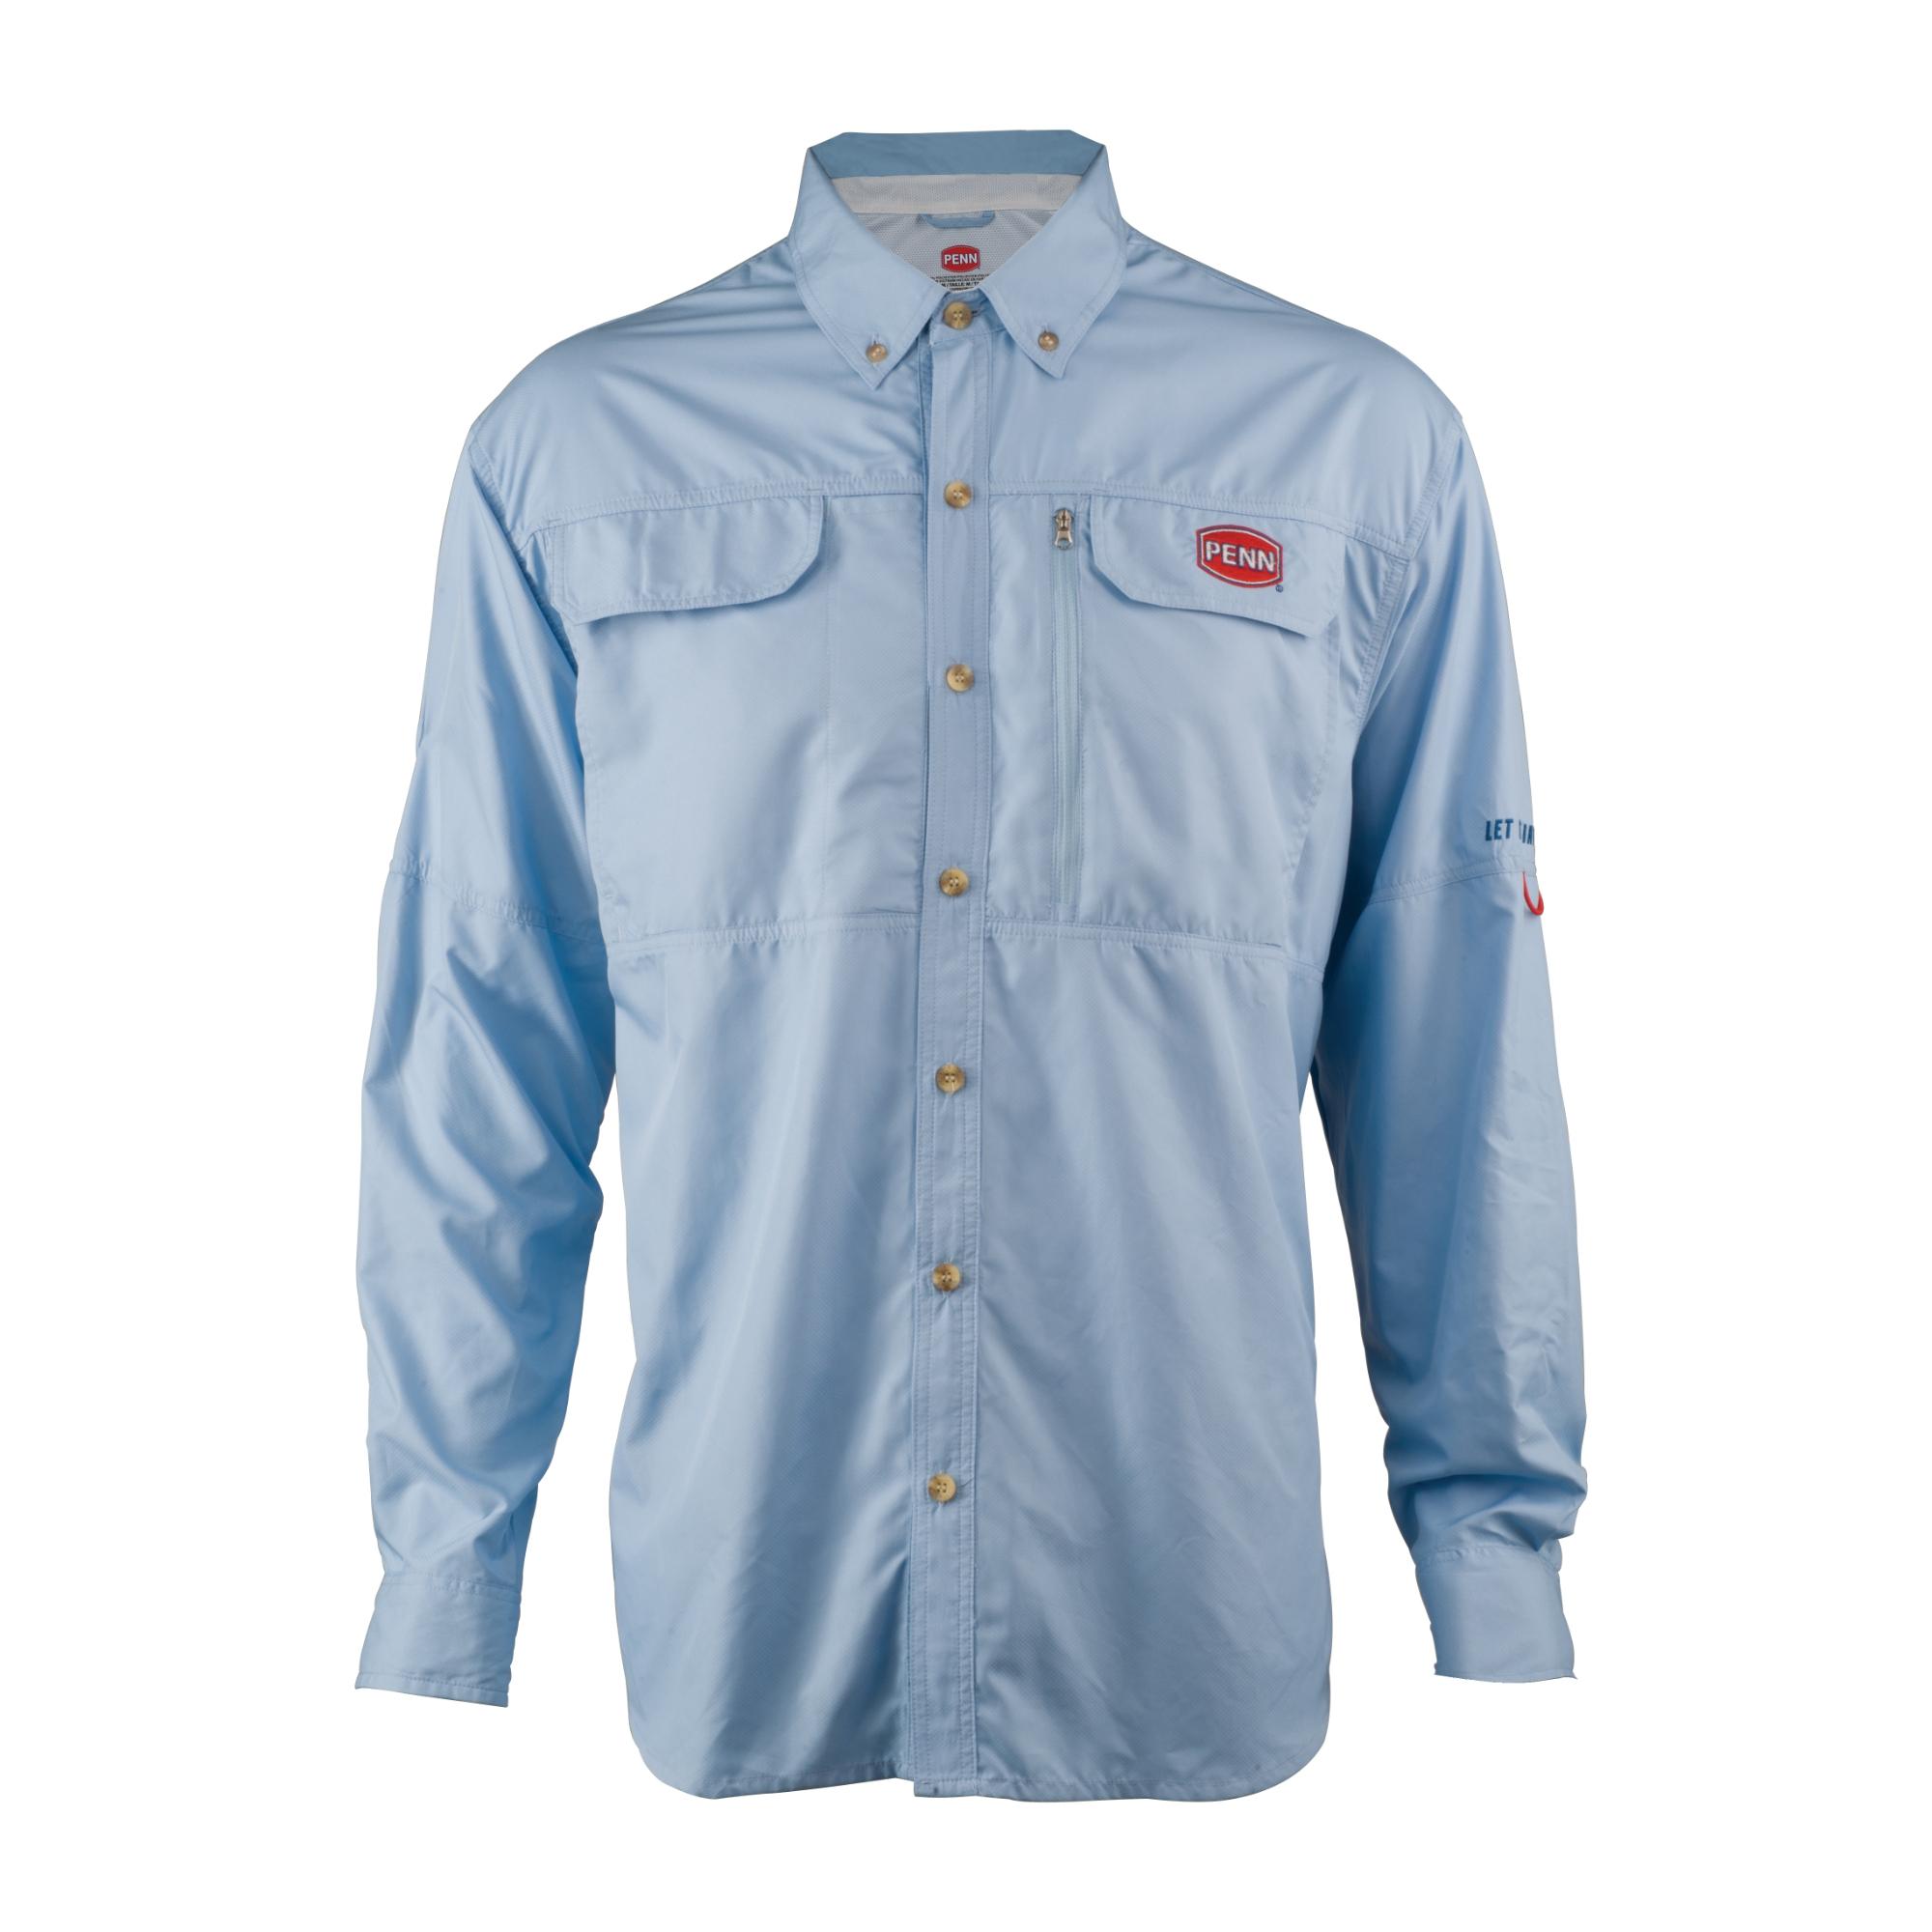 Penn vented performance shirts ebay for High performance fishing shirts